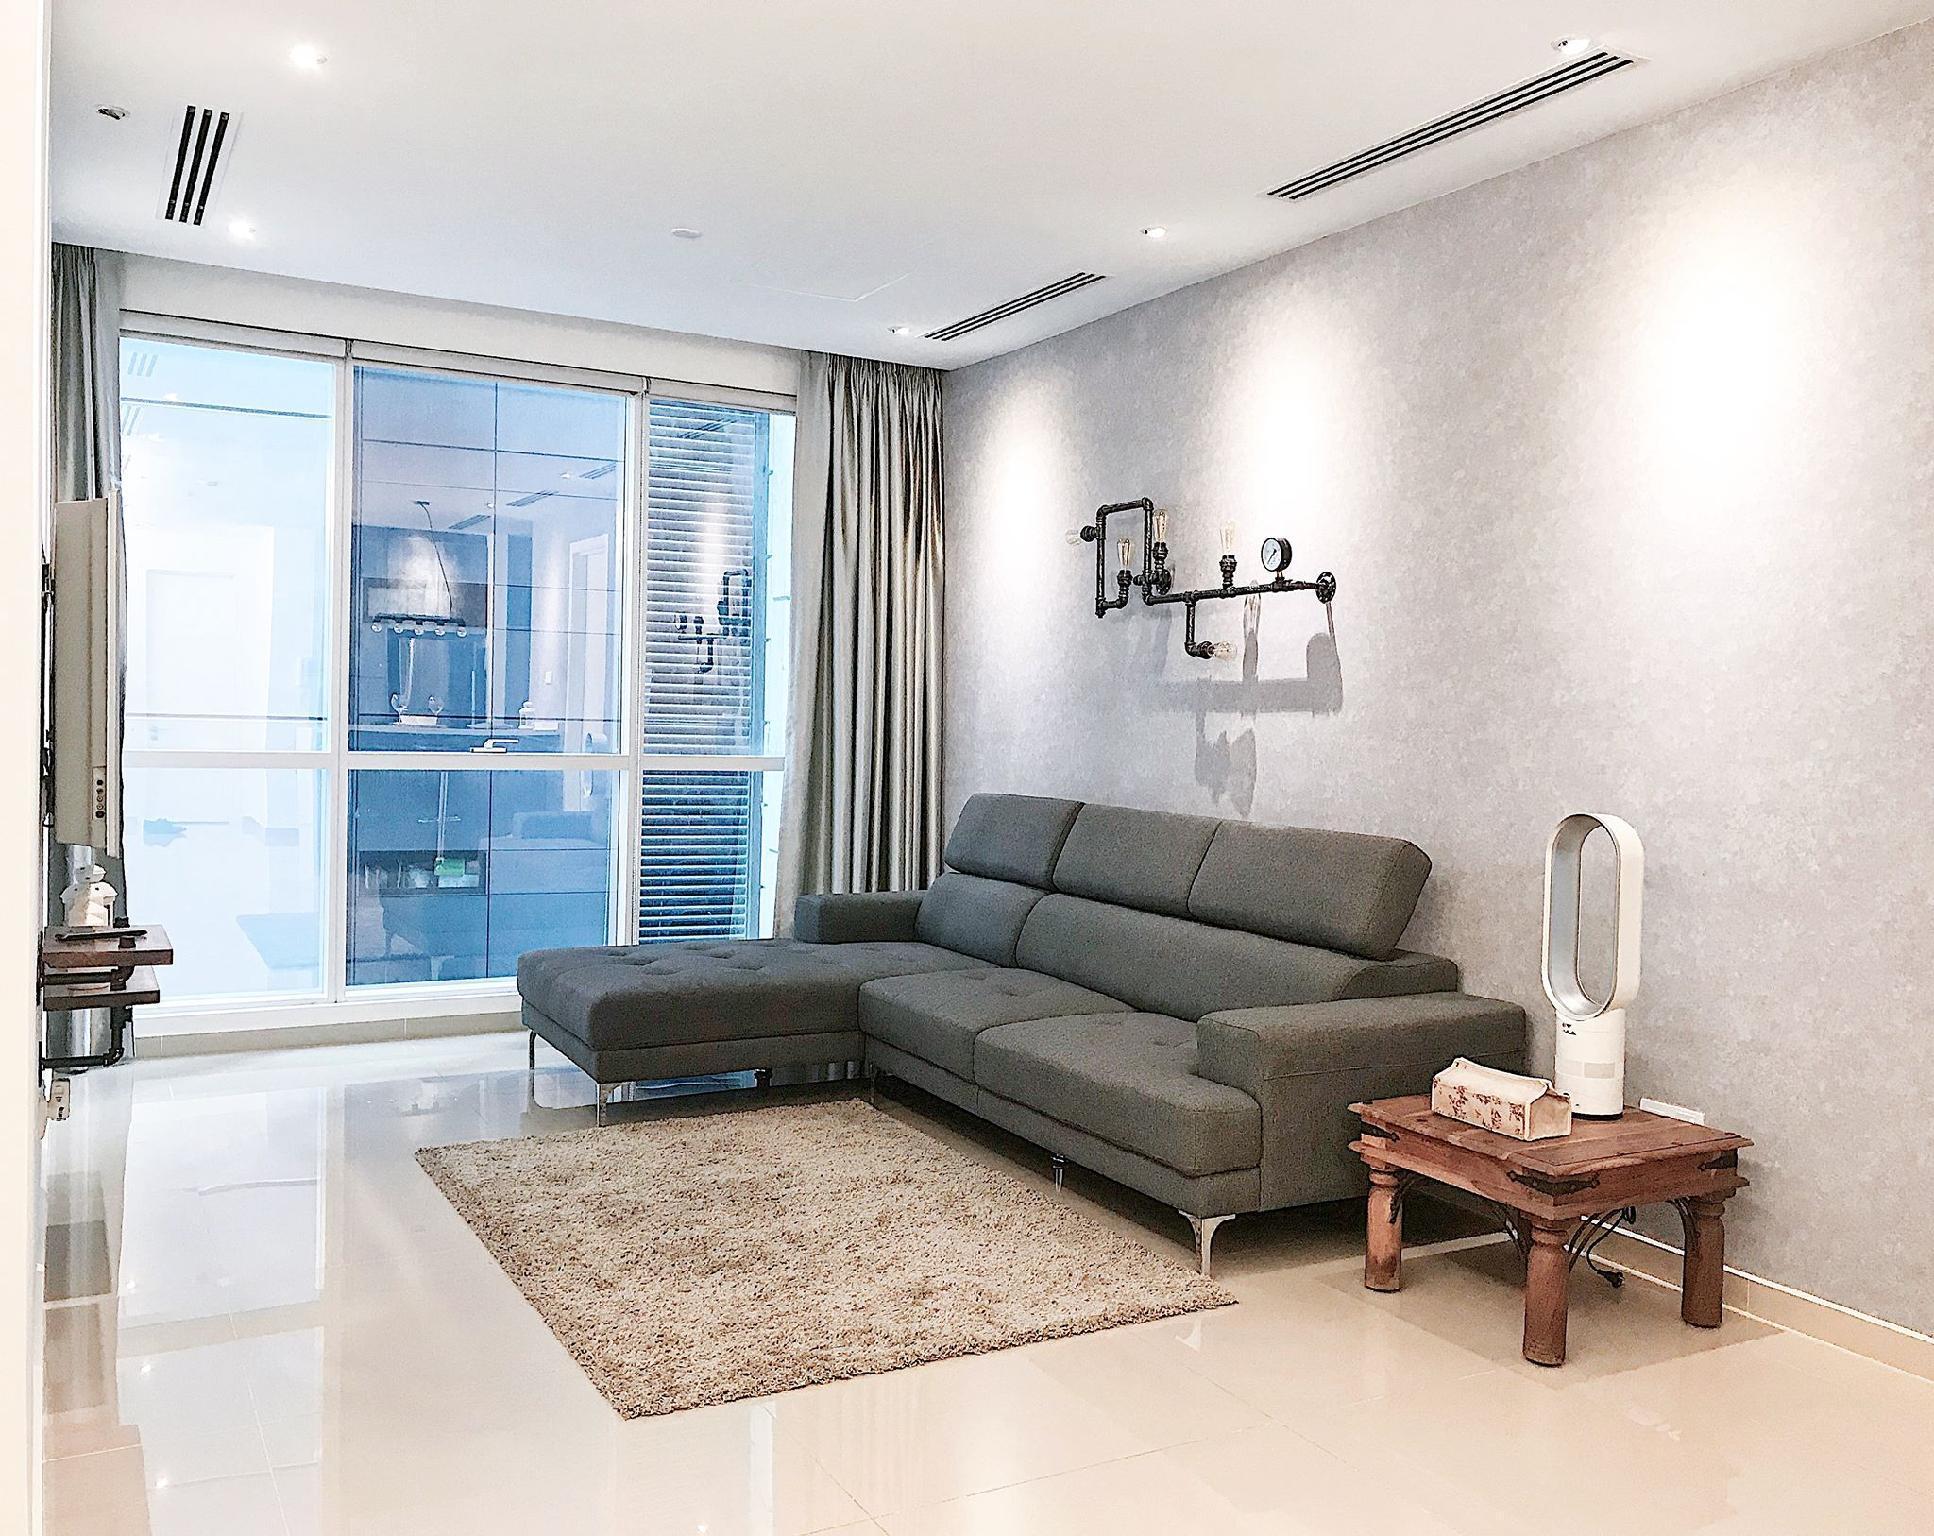 Binjai KLCC Luxury One Bedroom Suite